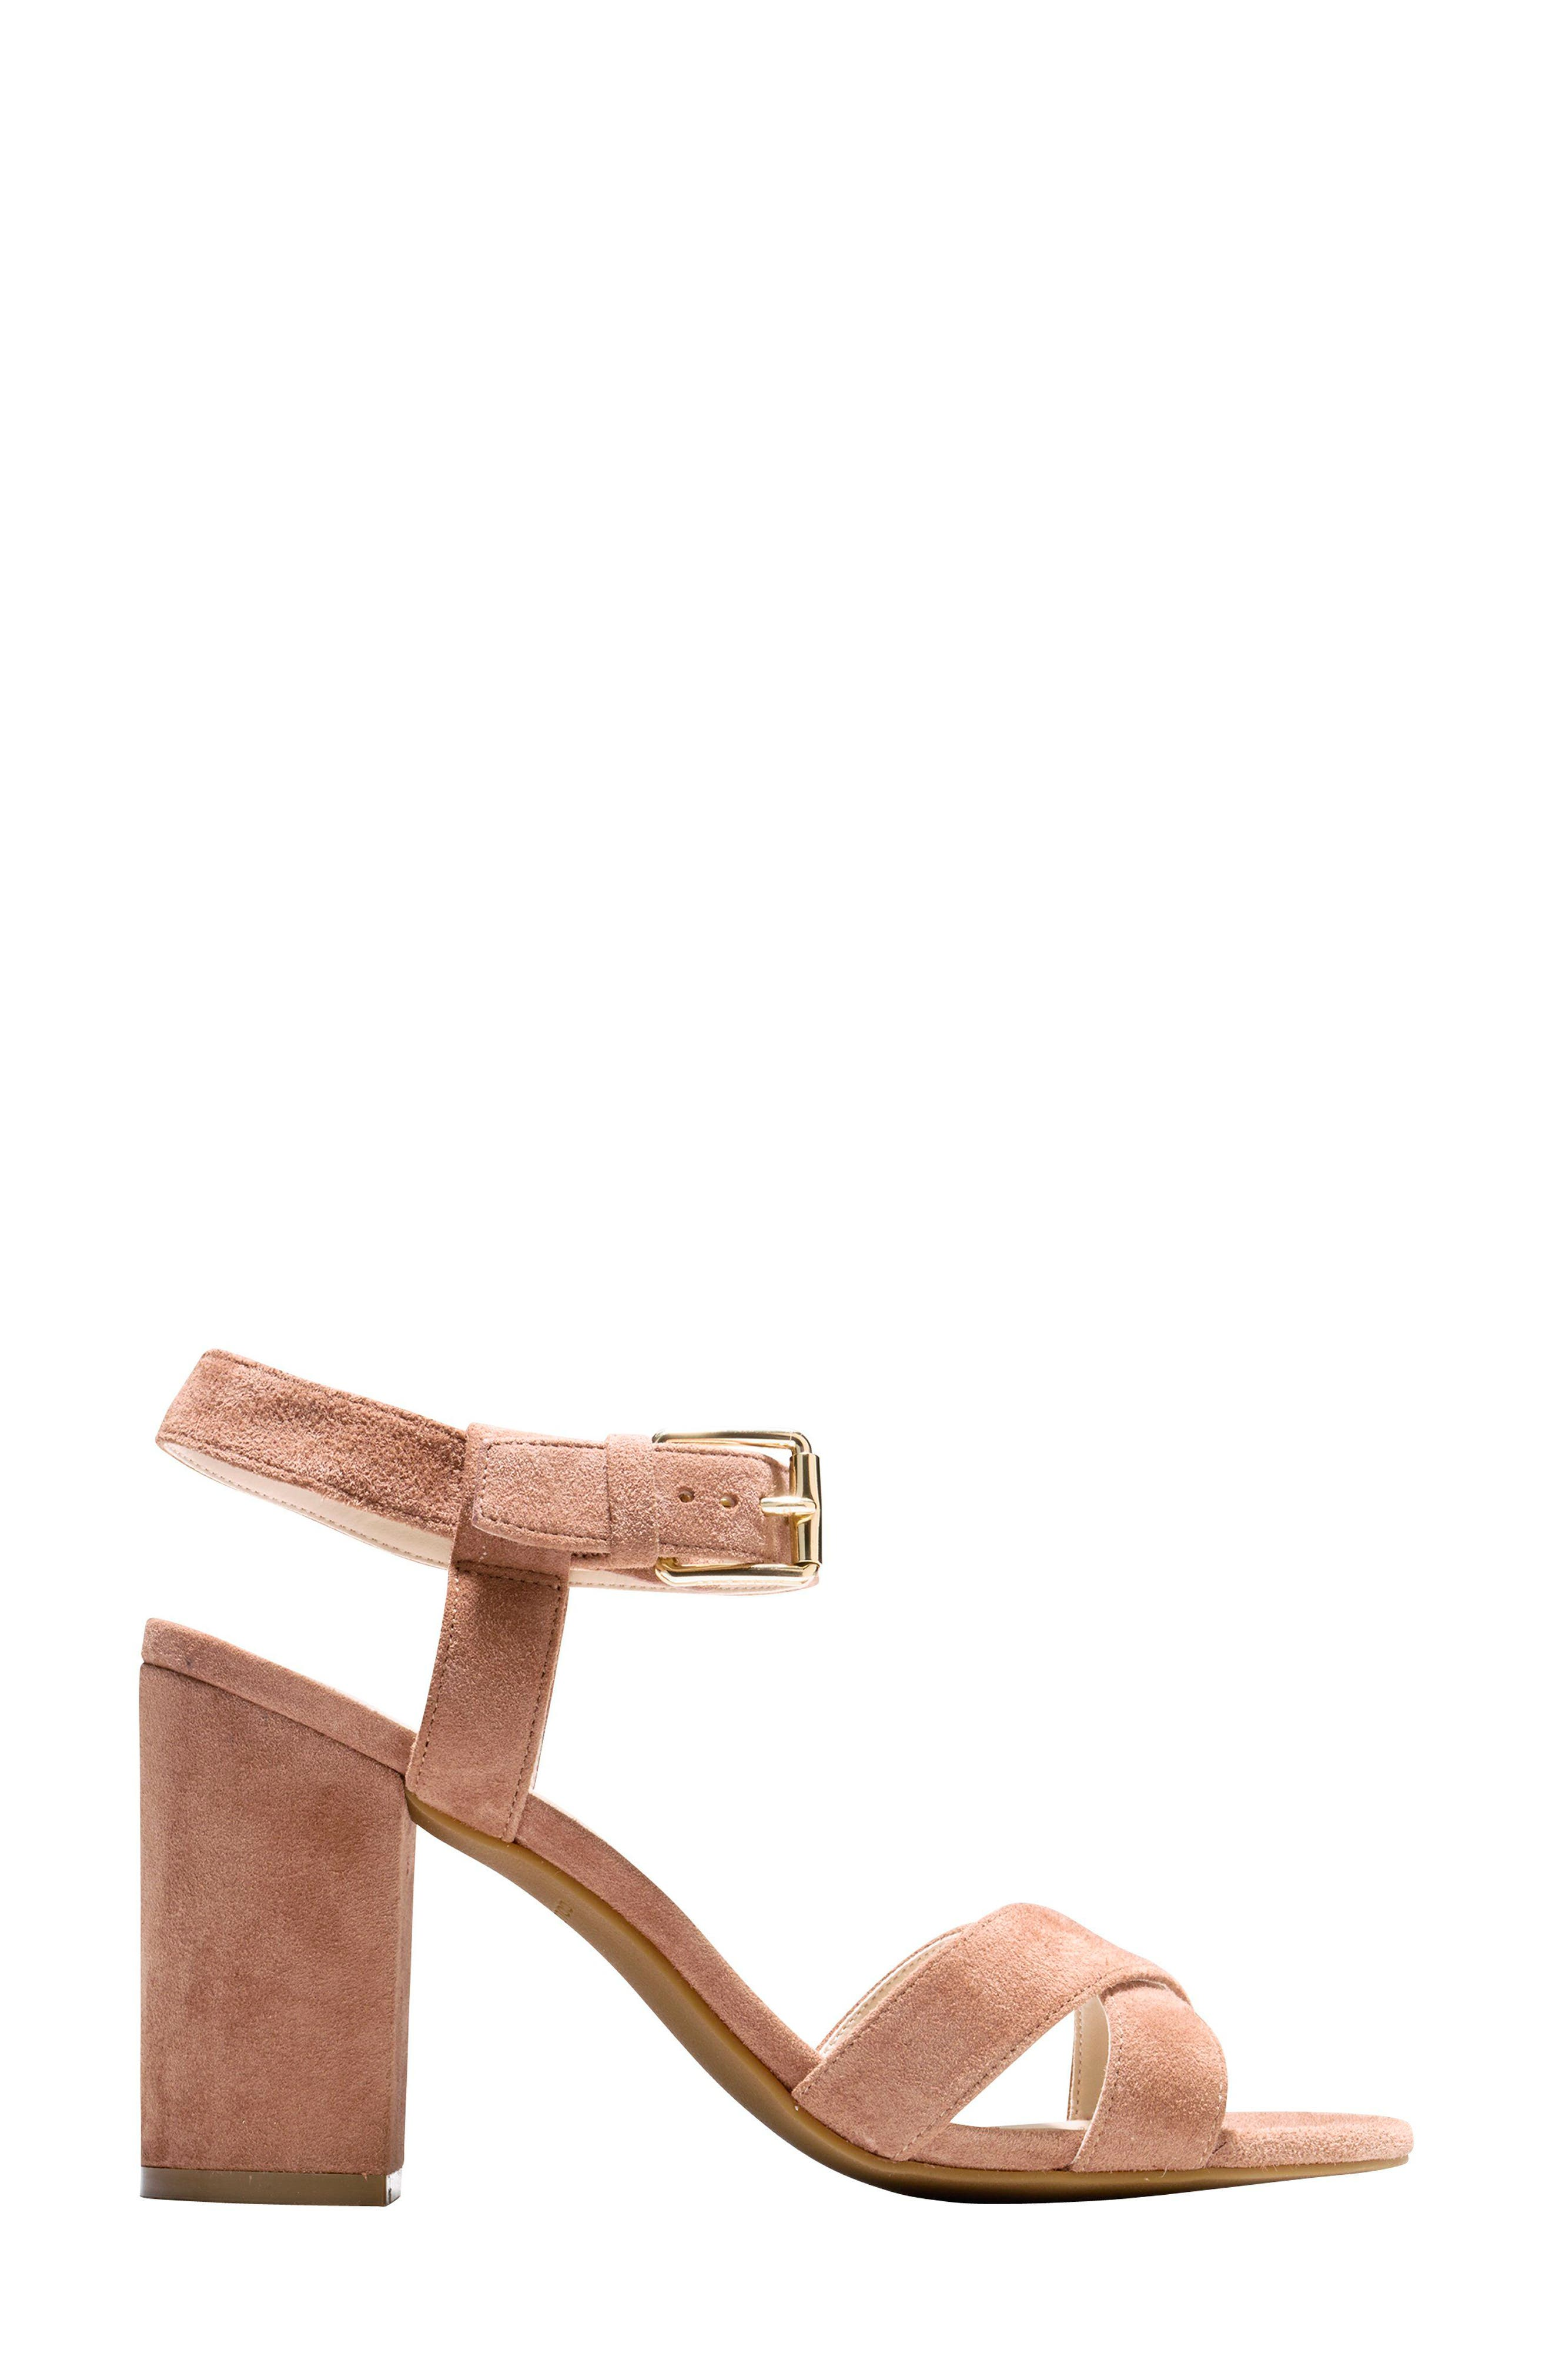 Alternate Image 3  - Cole Haan Kadi Ankle Strap Sandal (Women)